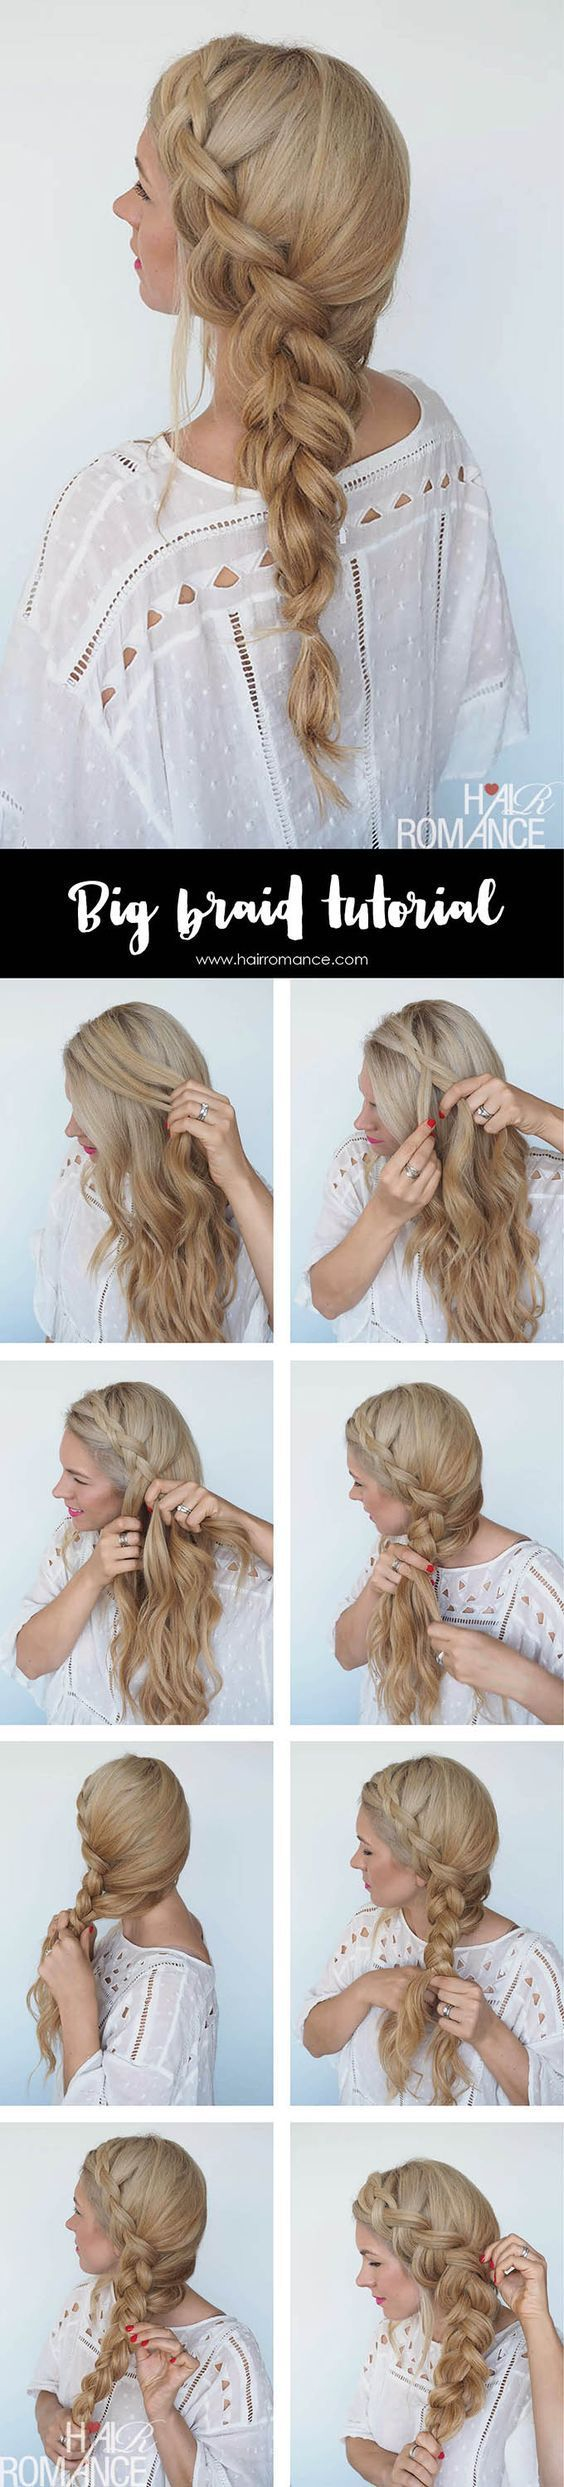 best 20+ short teen hairstyles ideas on pinterest | teen school